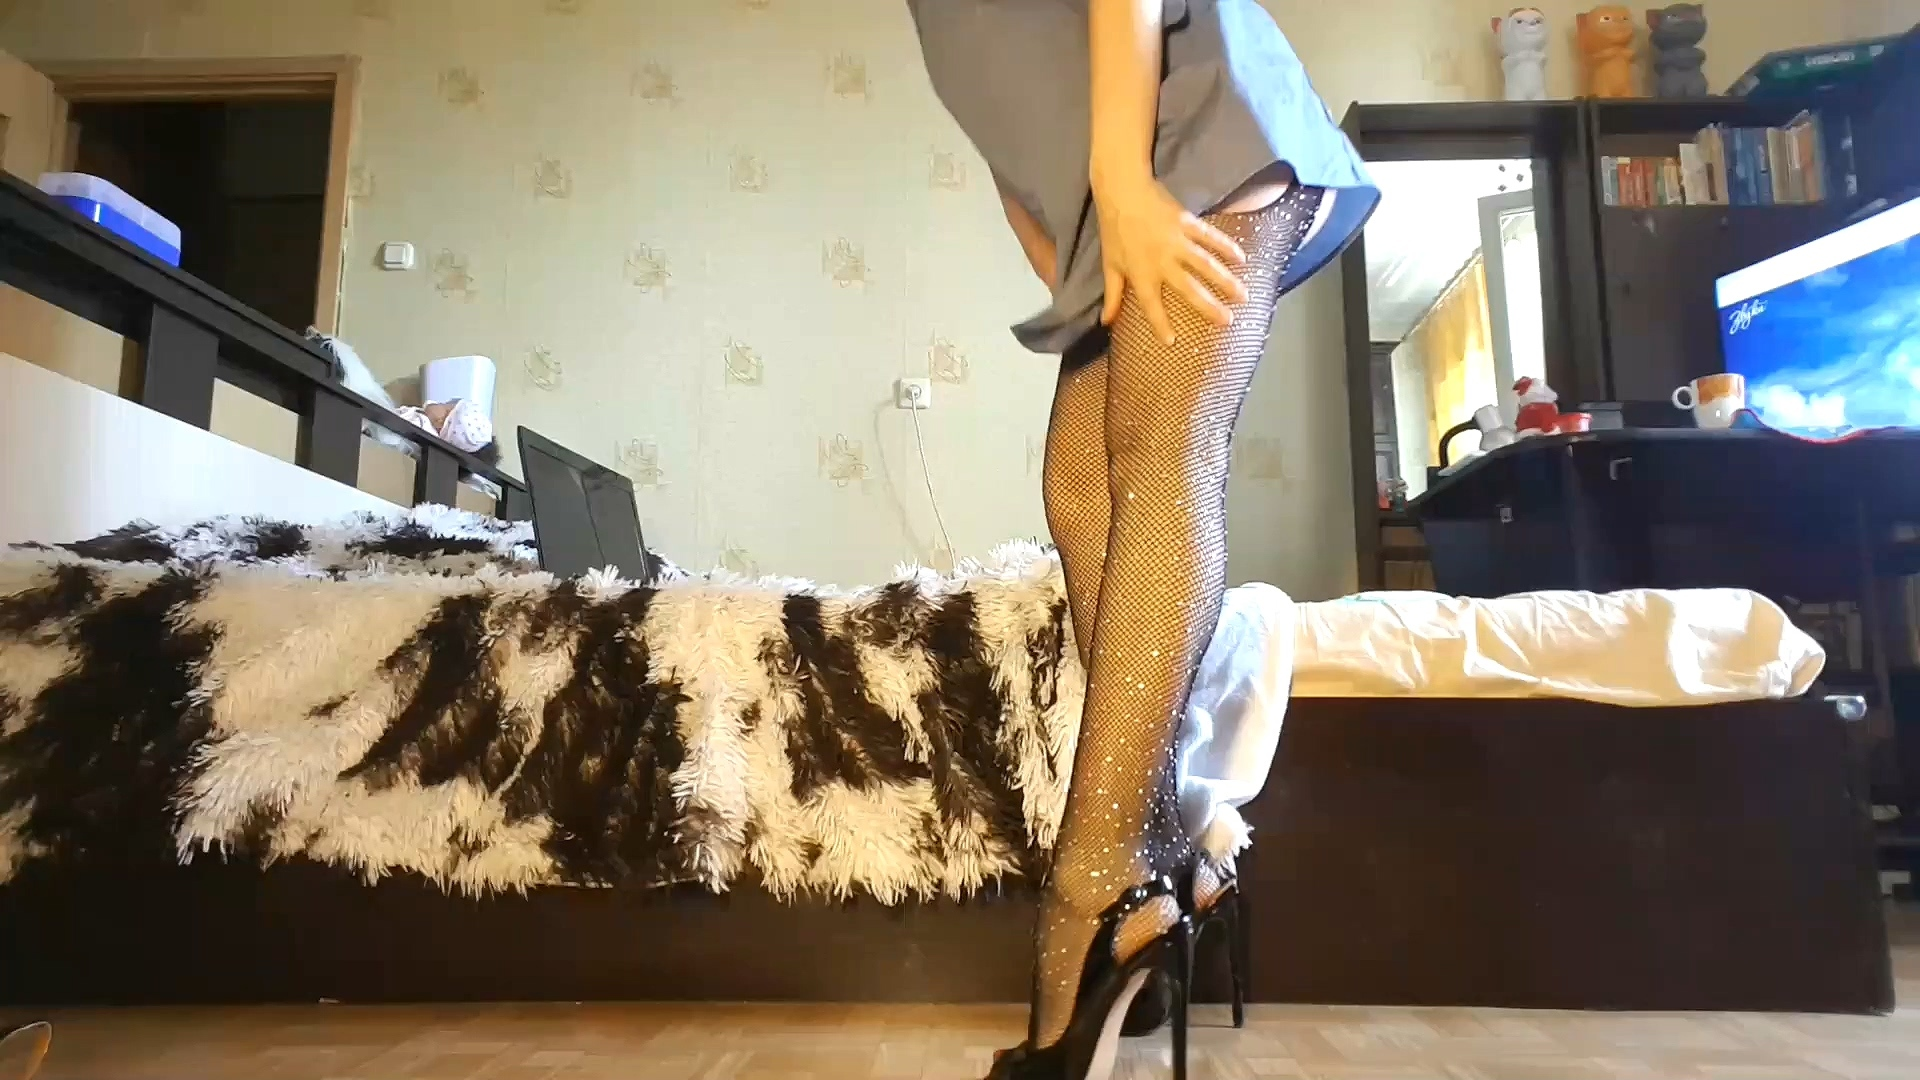 Footpantyhose2.mp4_20200810_093845.489.jpg